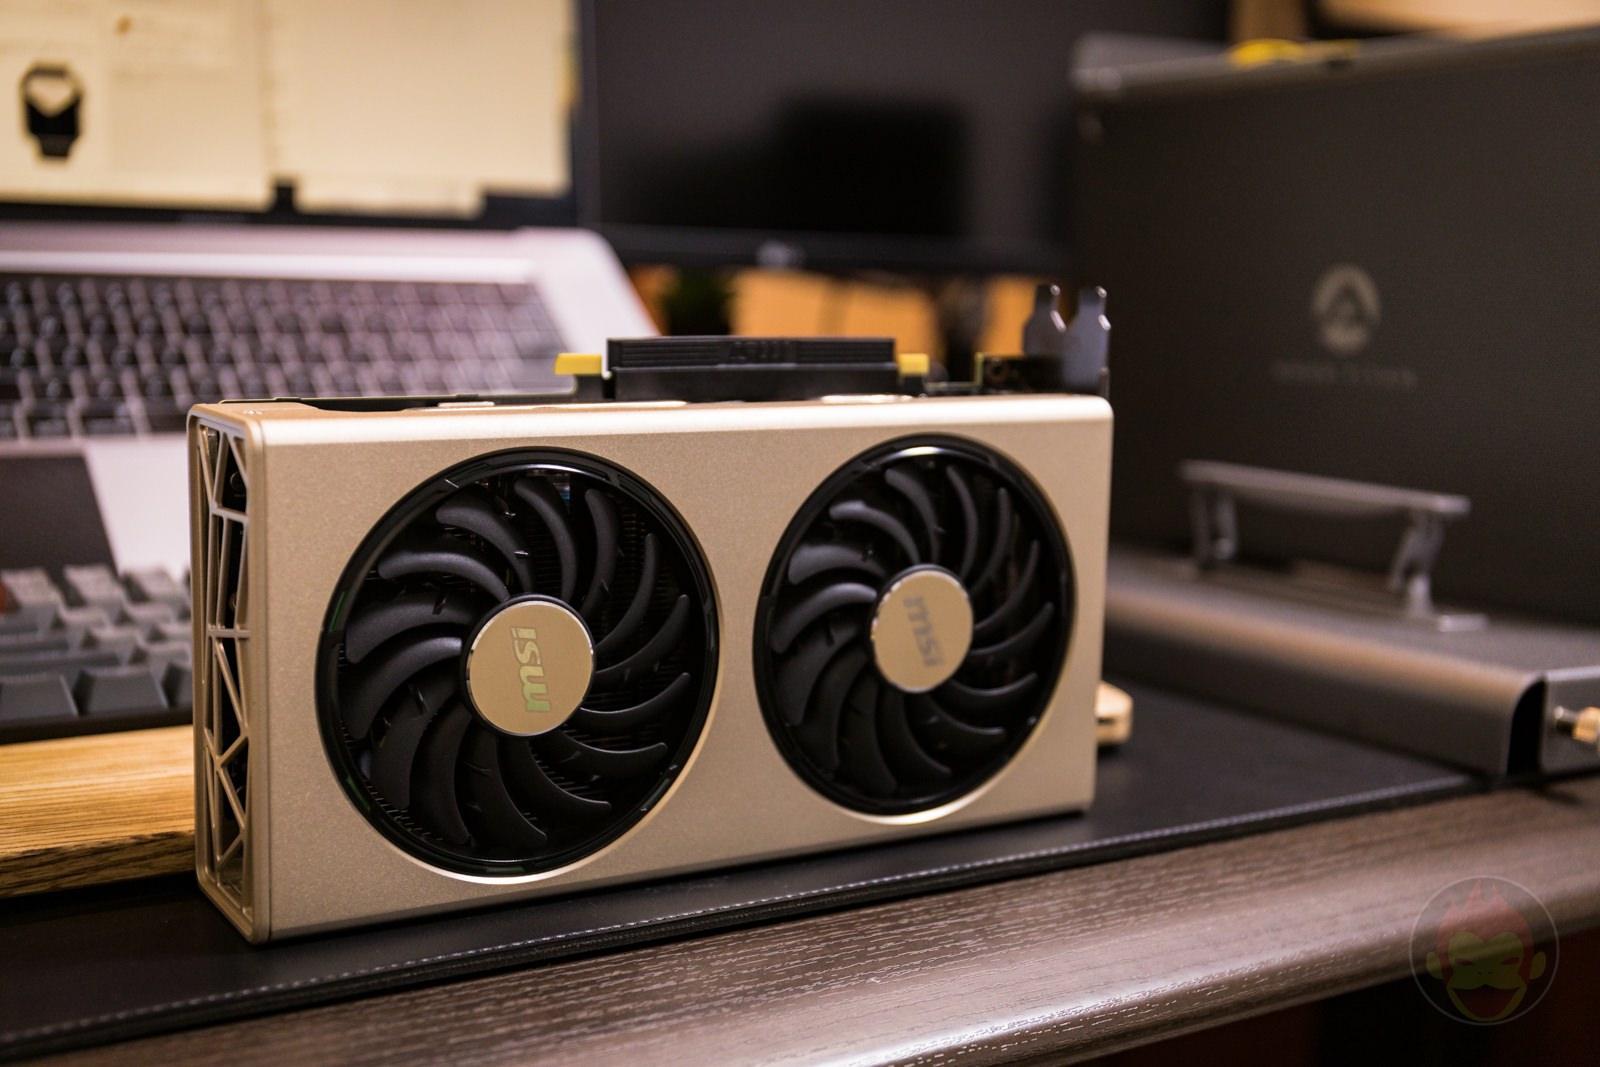 AKiTiO Node Titan with msi AMD Radeon RX 5700 XT Review 11